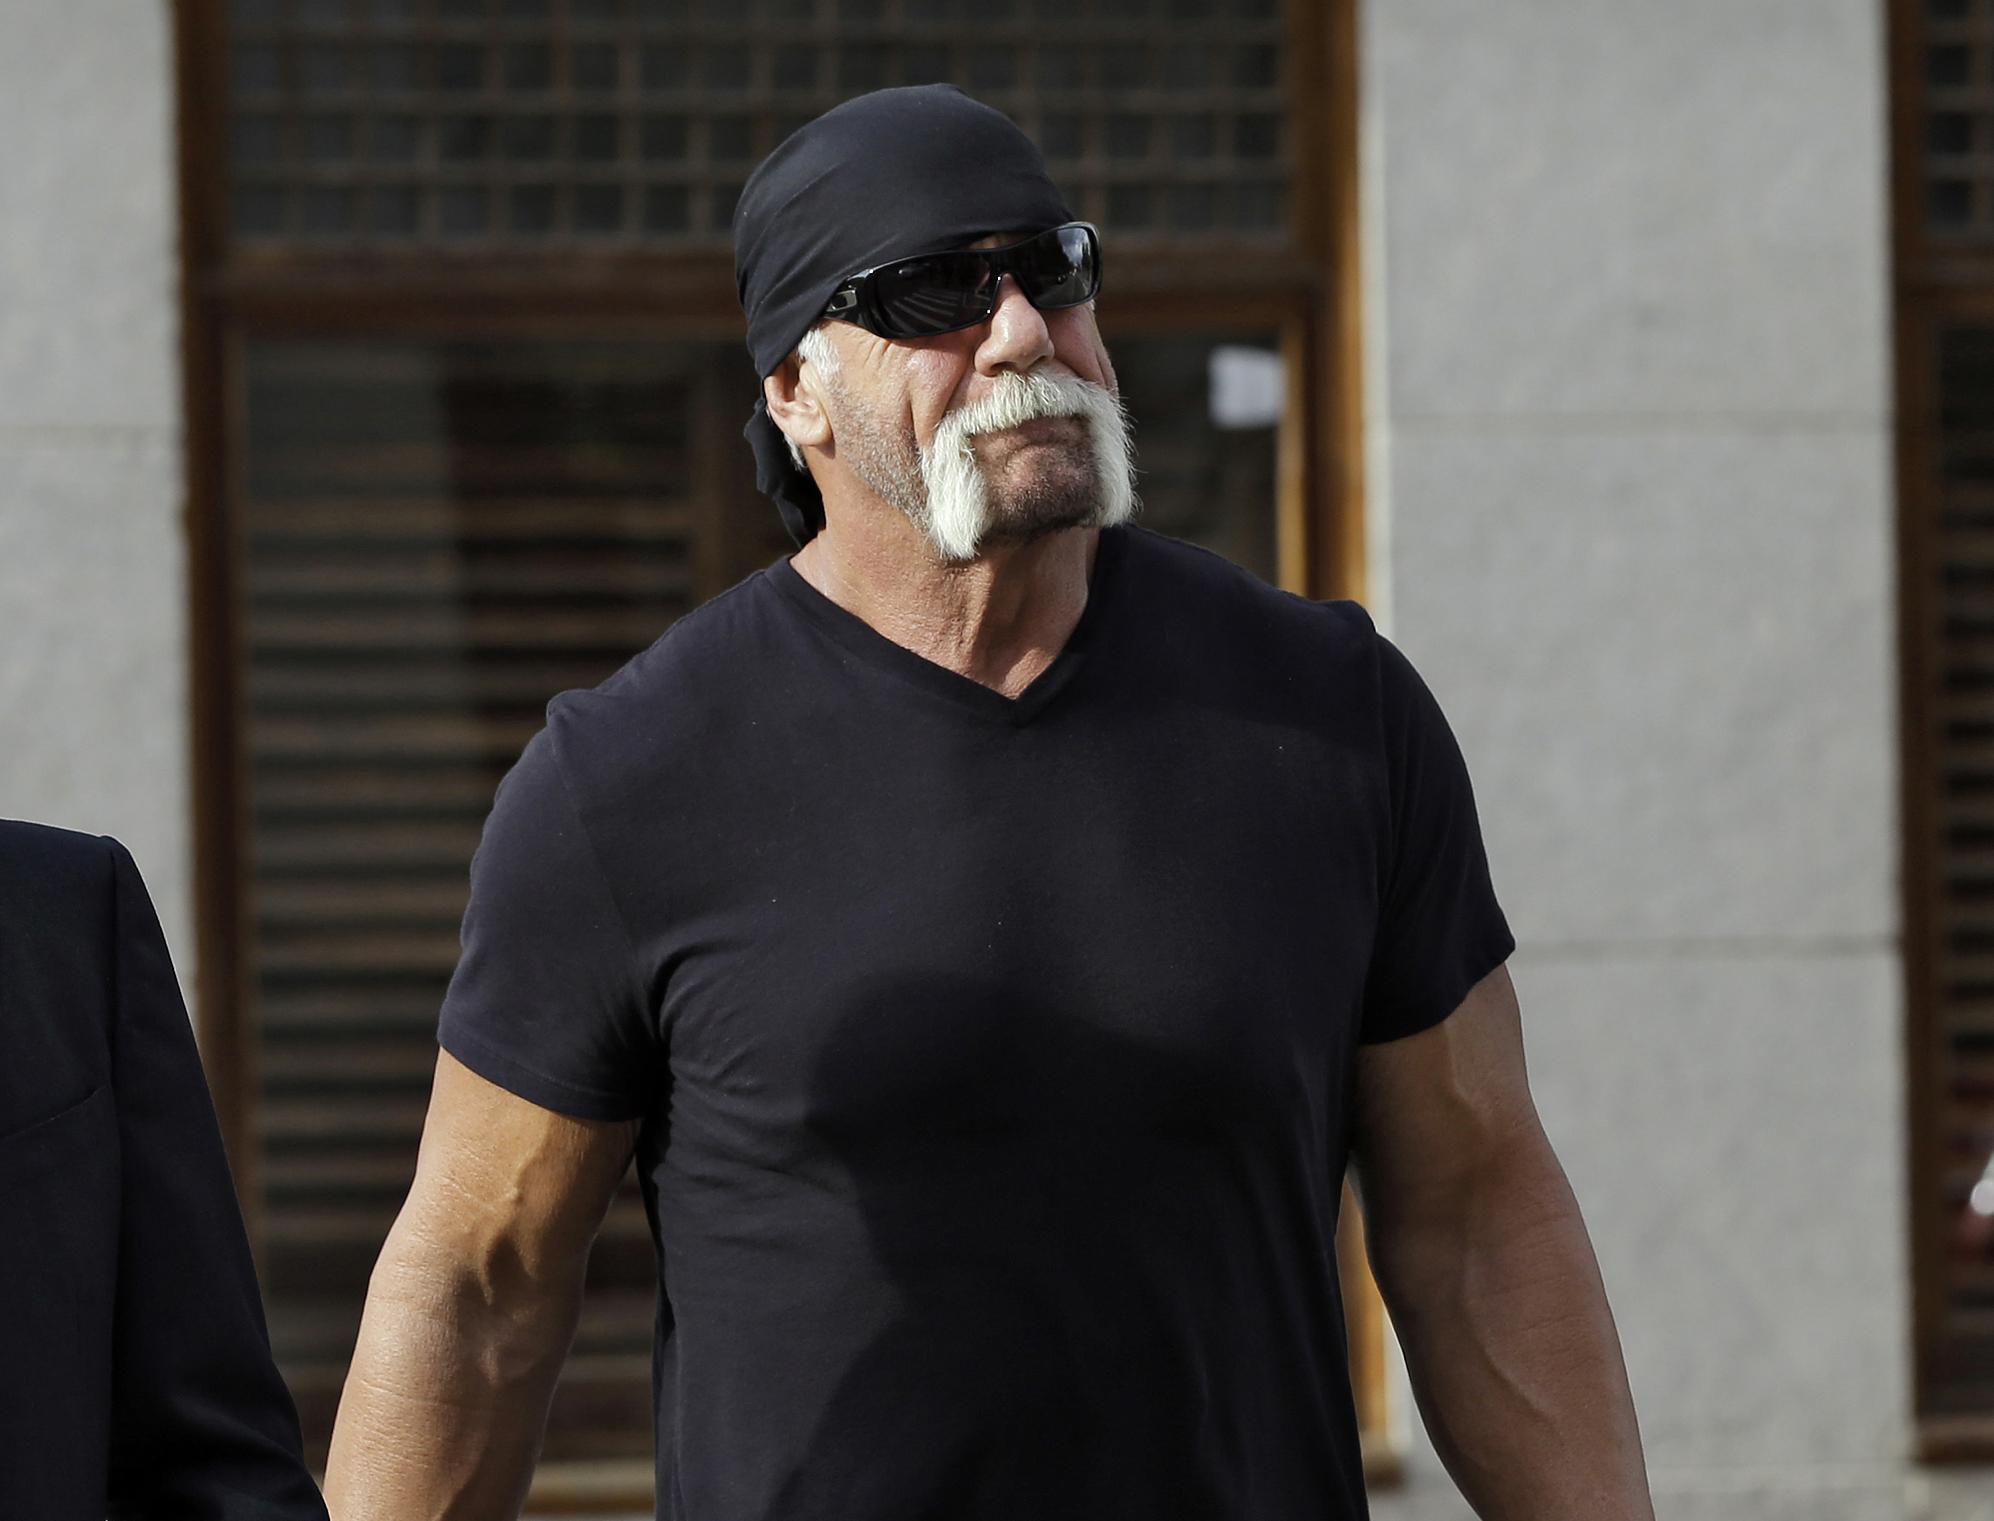 Hulk Hogan takes to Twitter after WWE cuts ties